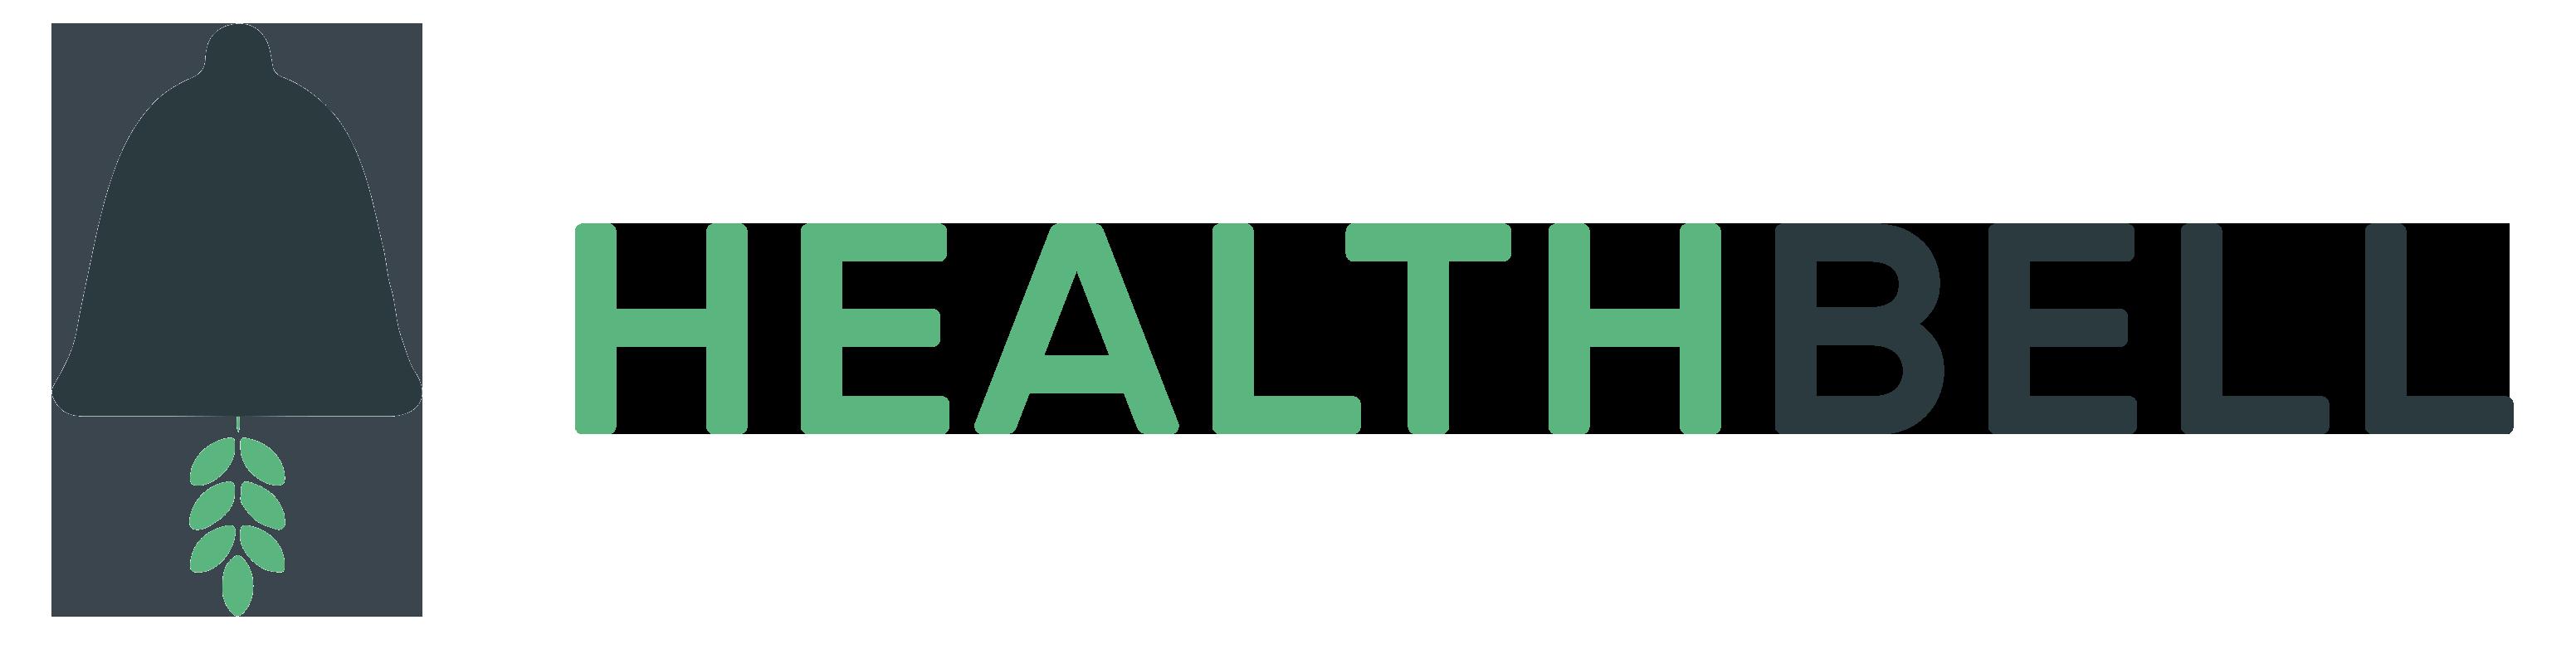 Healthbell